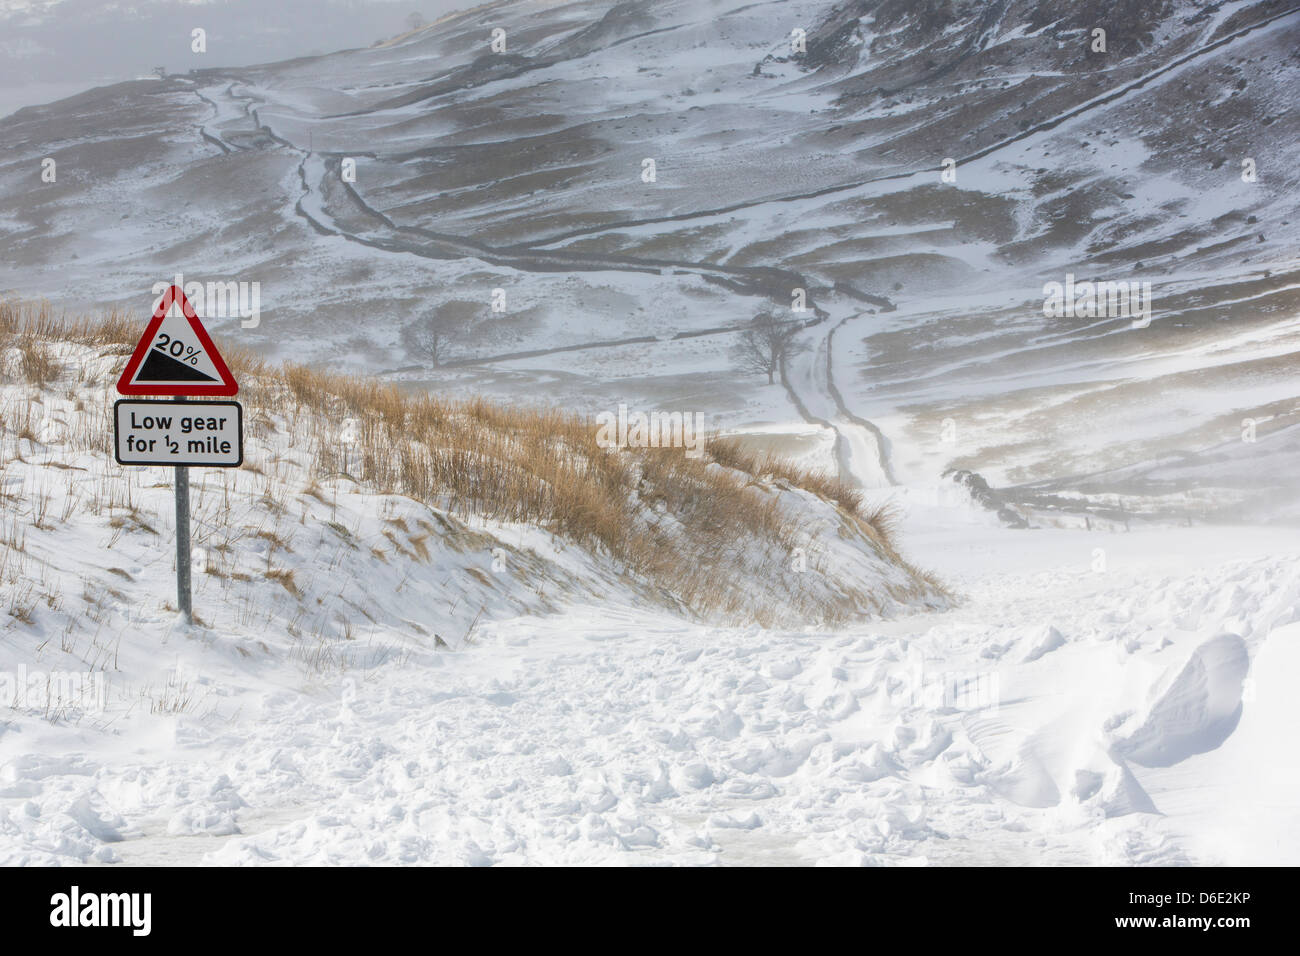 Snow Drift Granite : Massive snow drifts block the kirkstone pass road above